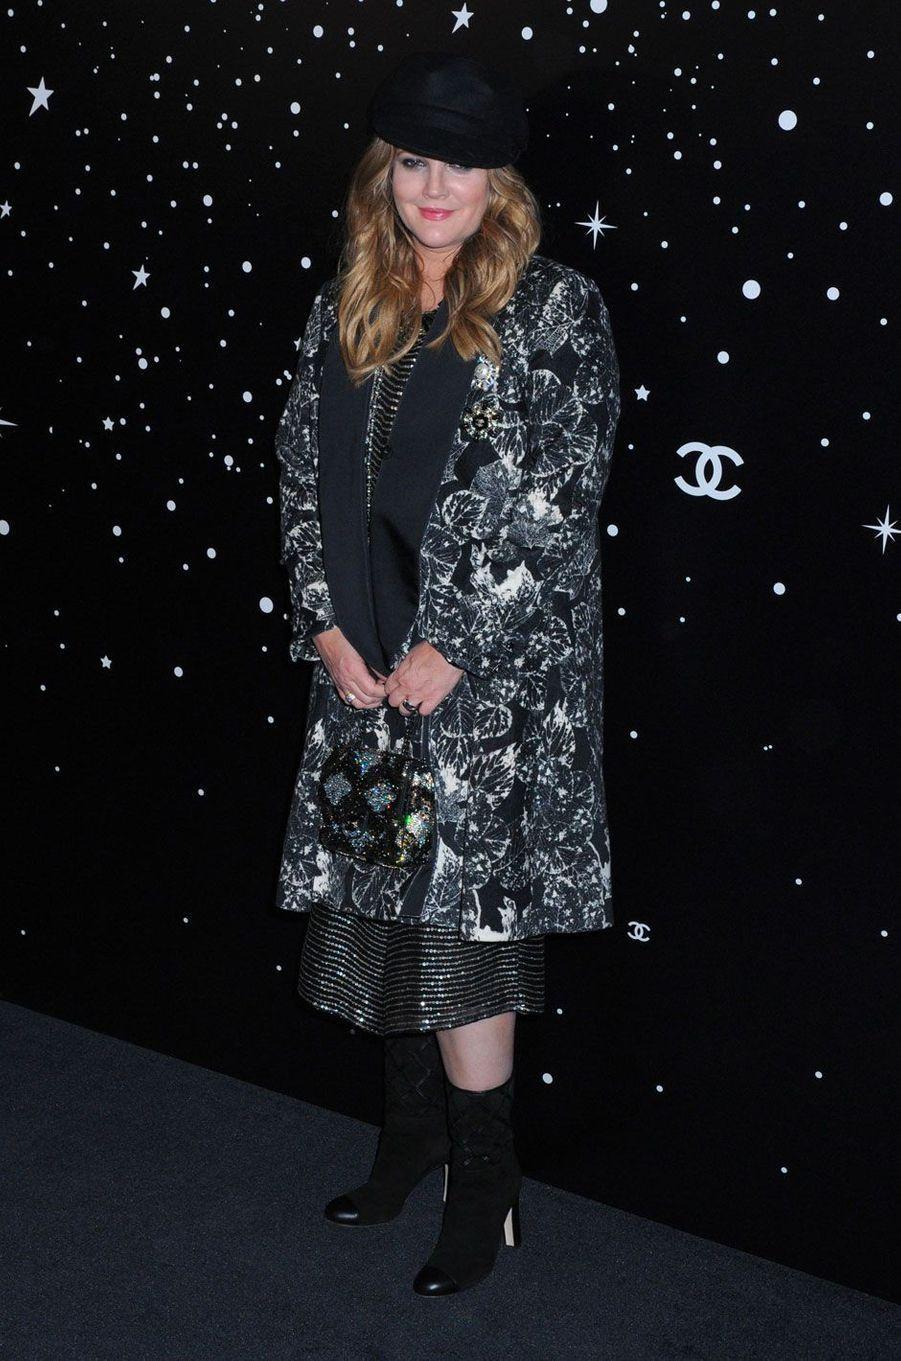 Drew Barrymore au MoMA le 19 novembre 2018